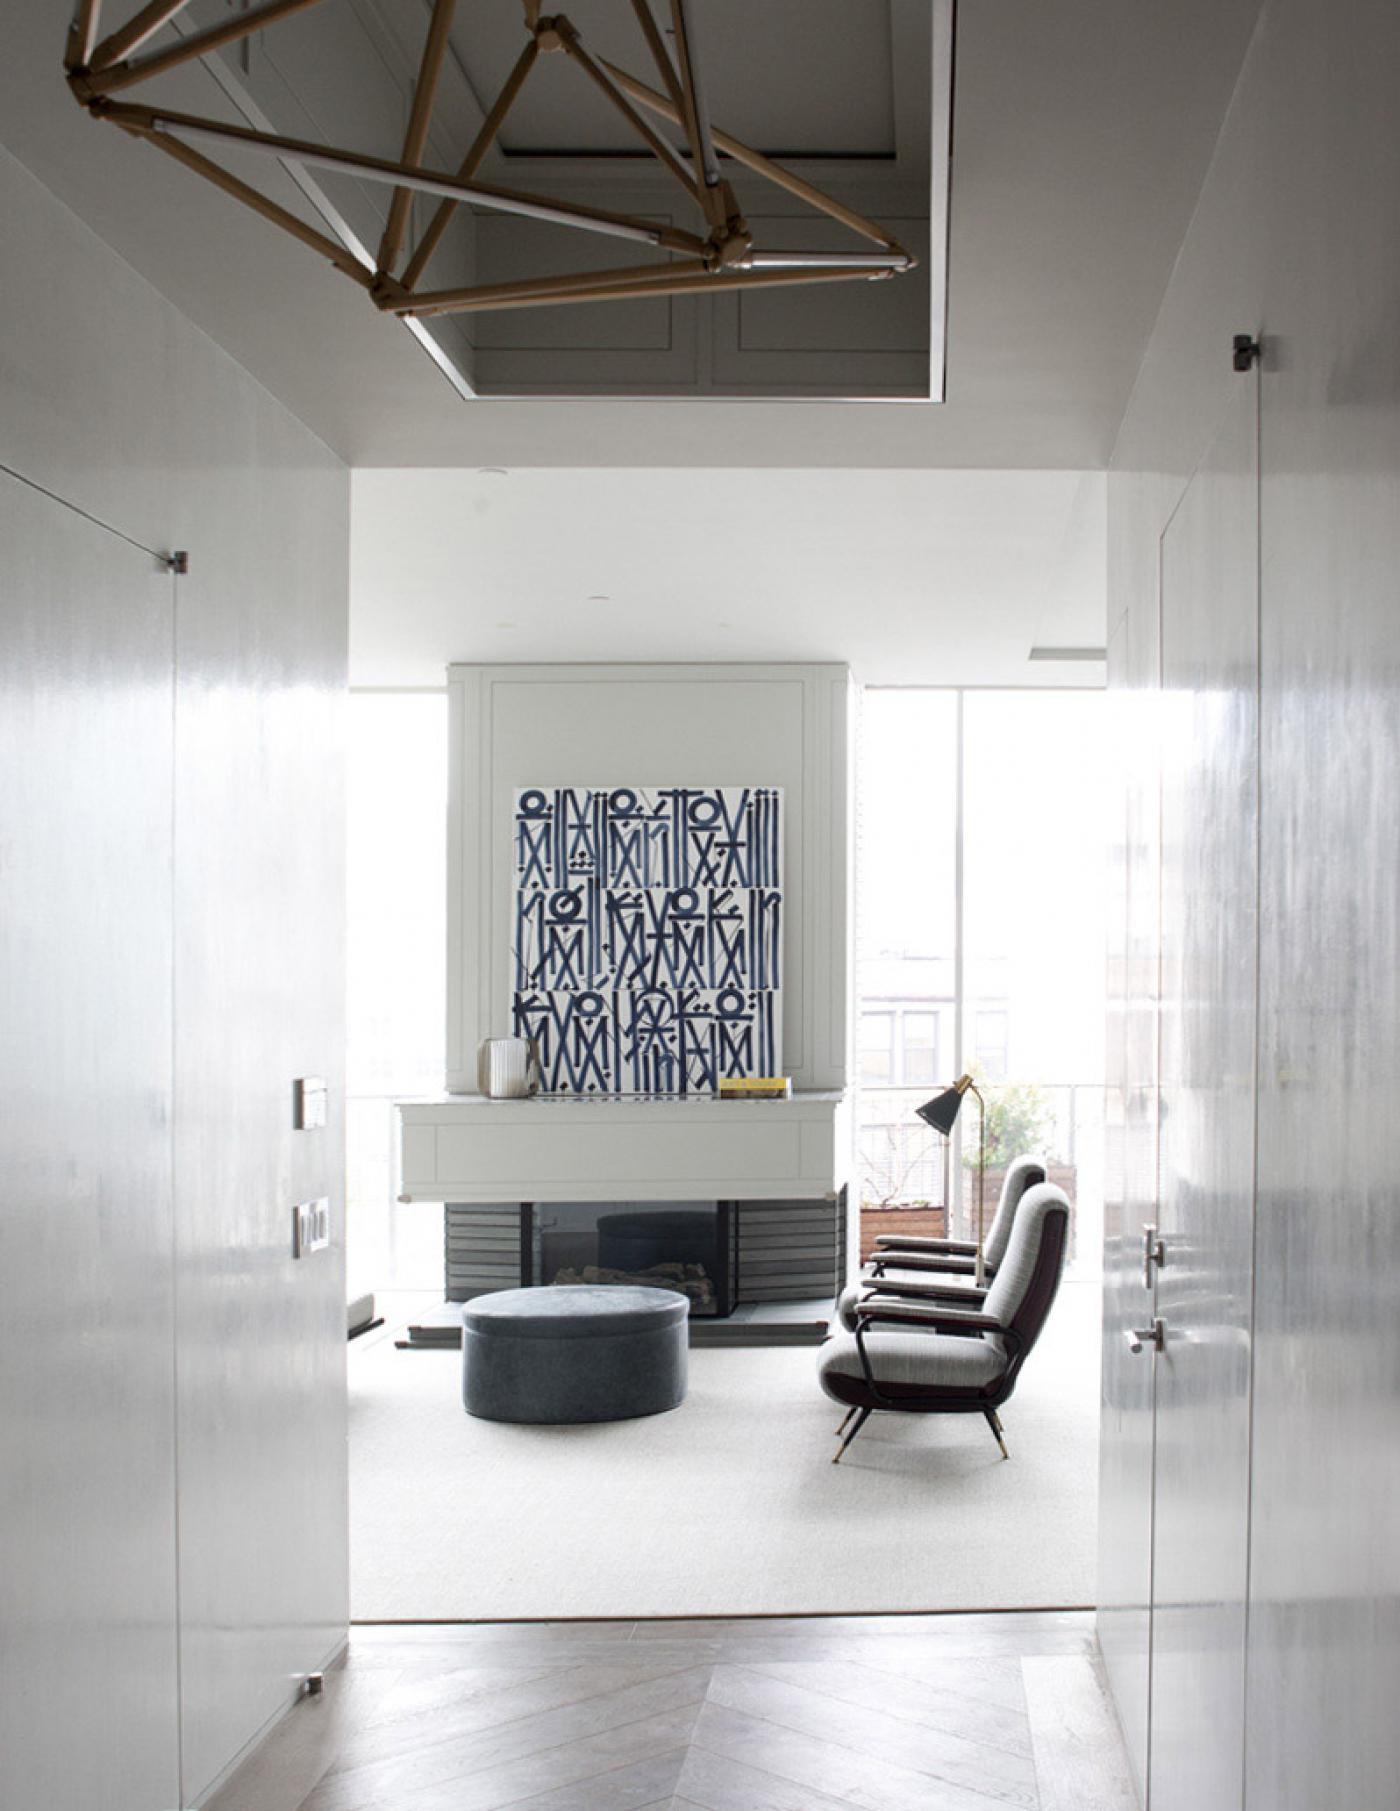 Shawn henderson interior design bond street www shawnhenderson com · image title